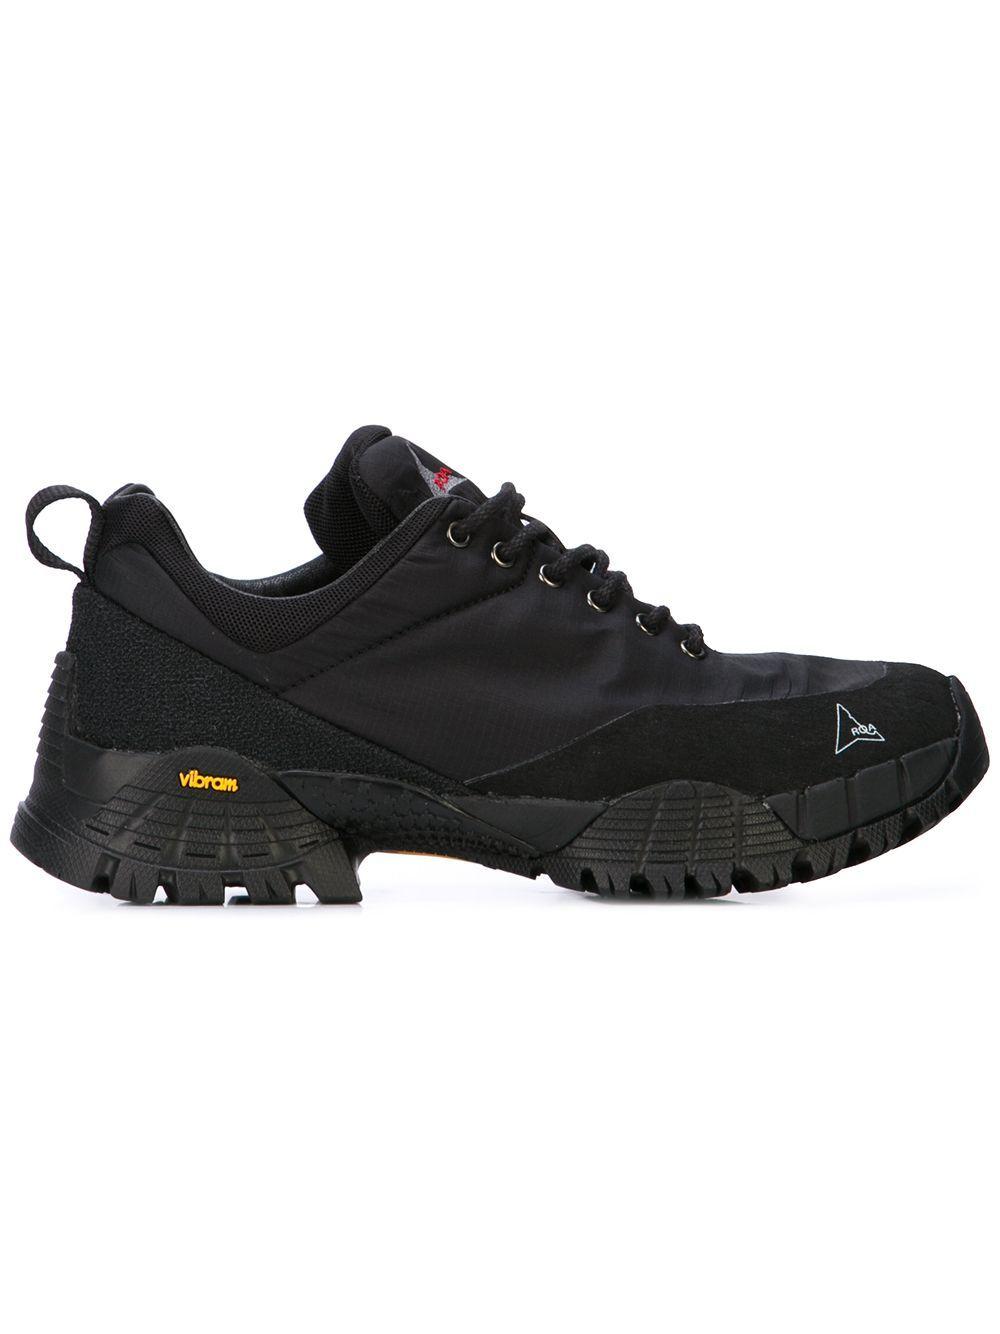 8ede87393 ROA ROA CHUNKY SOLE SNEAKERS - BLACK. #roa #shoes | Roa in 2019 ...